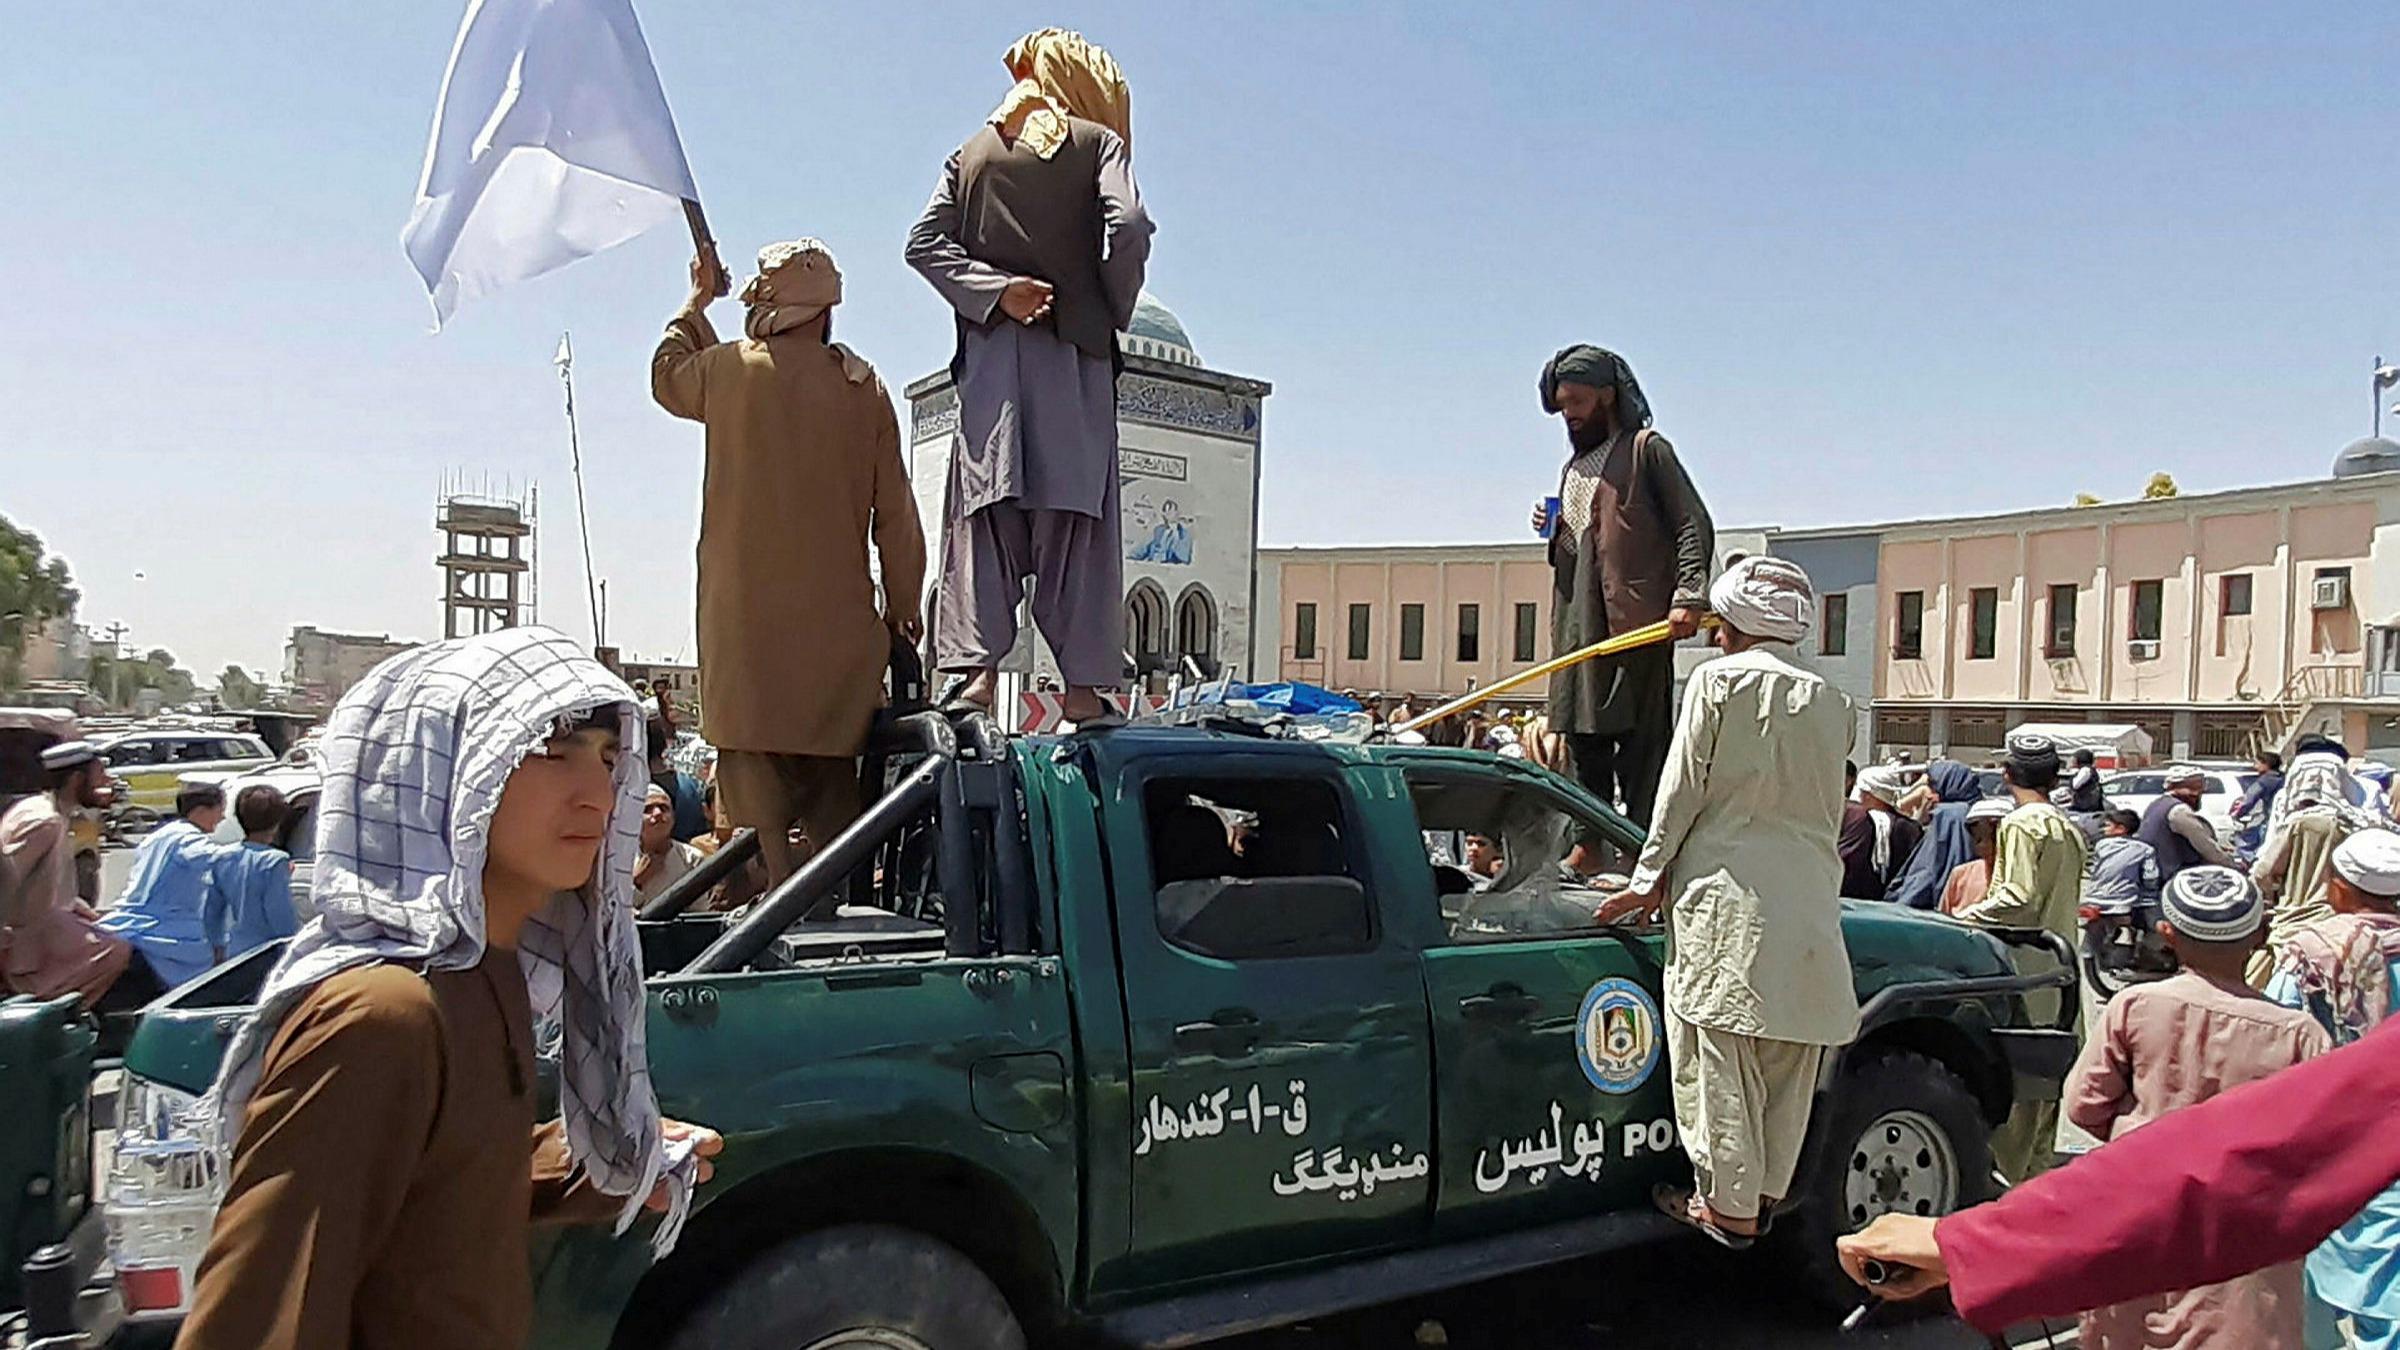 Taliban fighters Kandahar